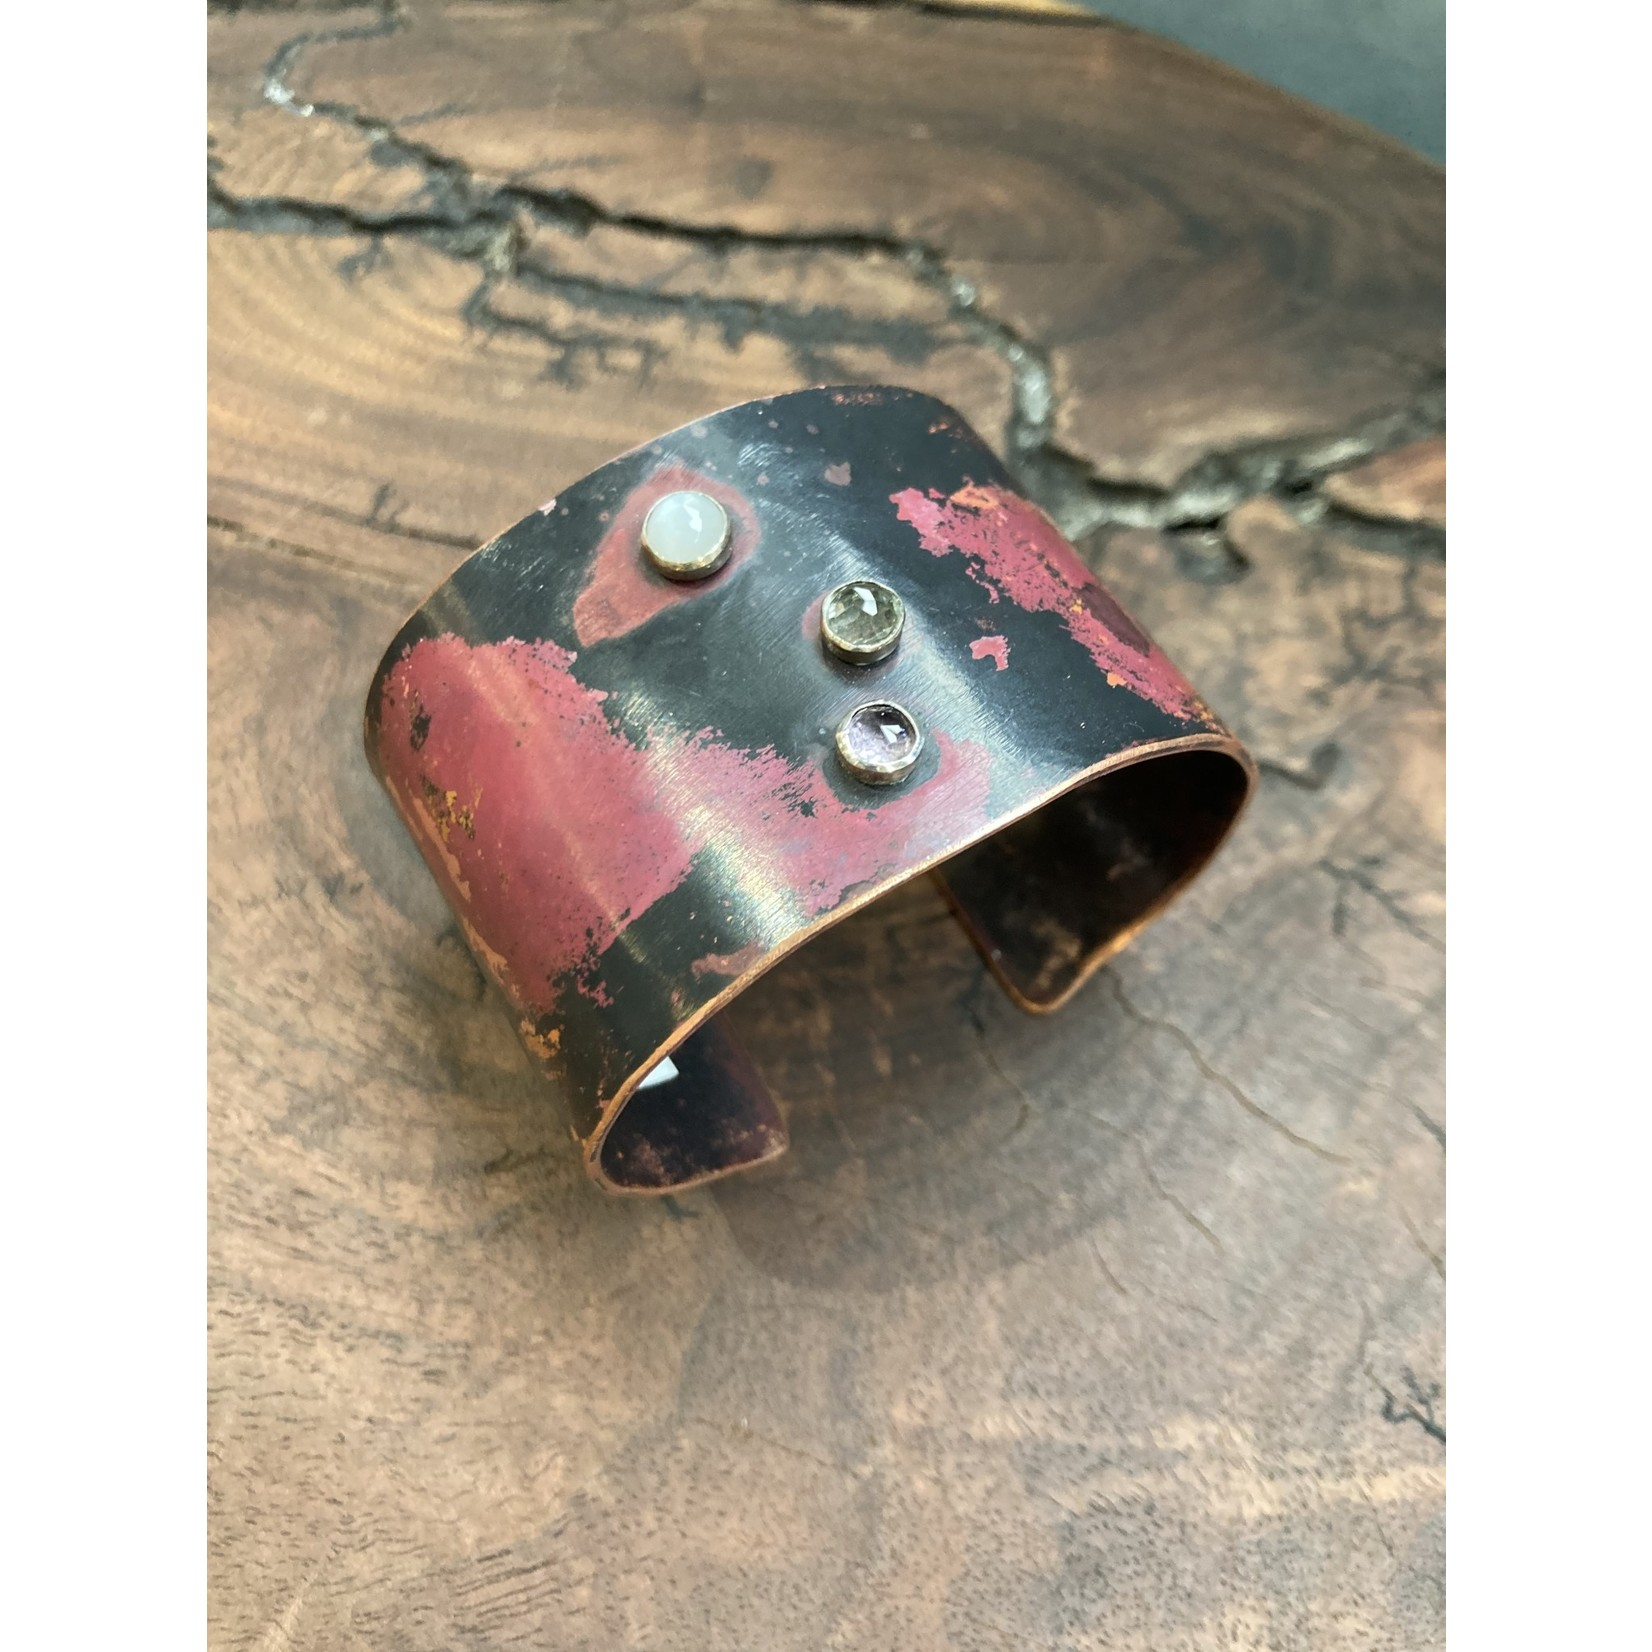 Wendy Todd Wendy Todd #243 Copper Cuff with moonstone, prehnite  & amethyst